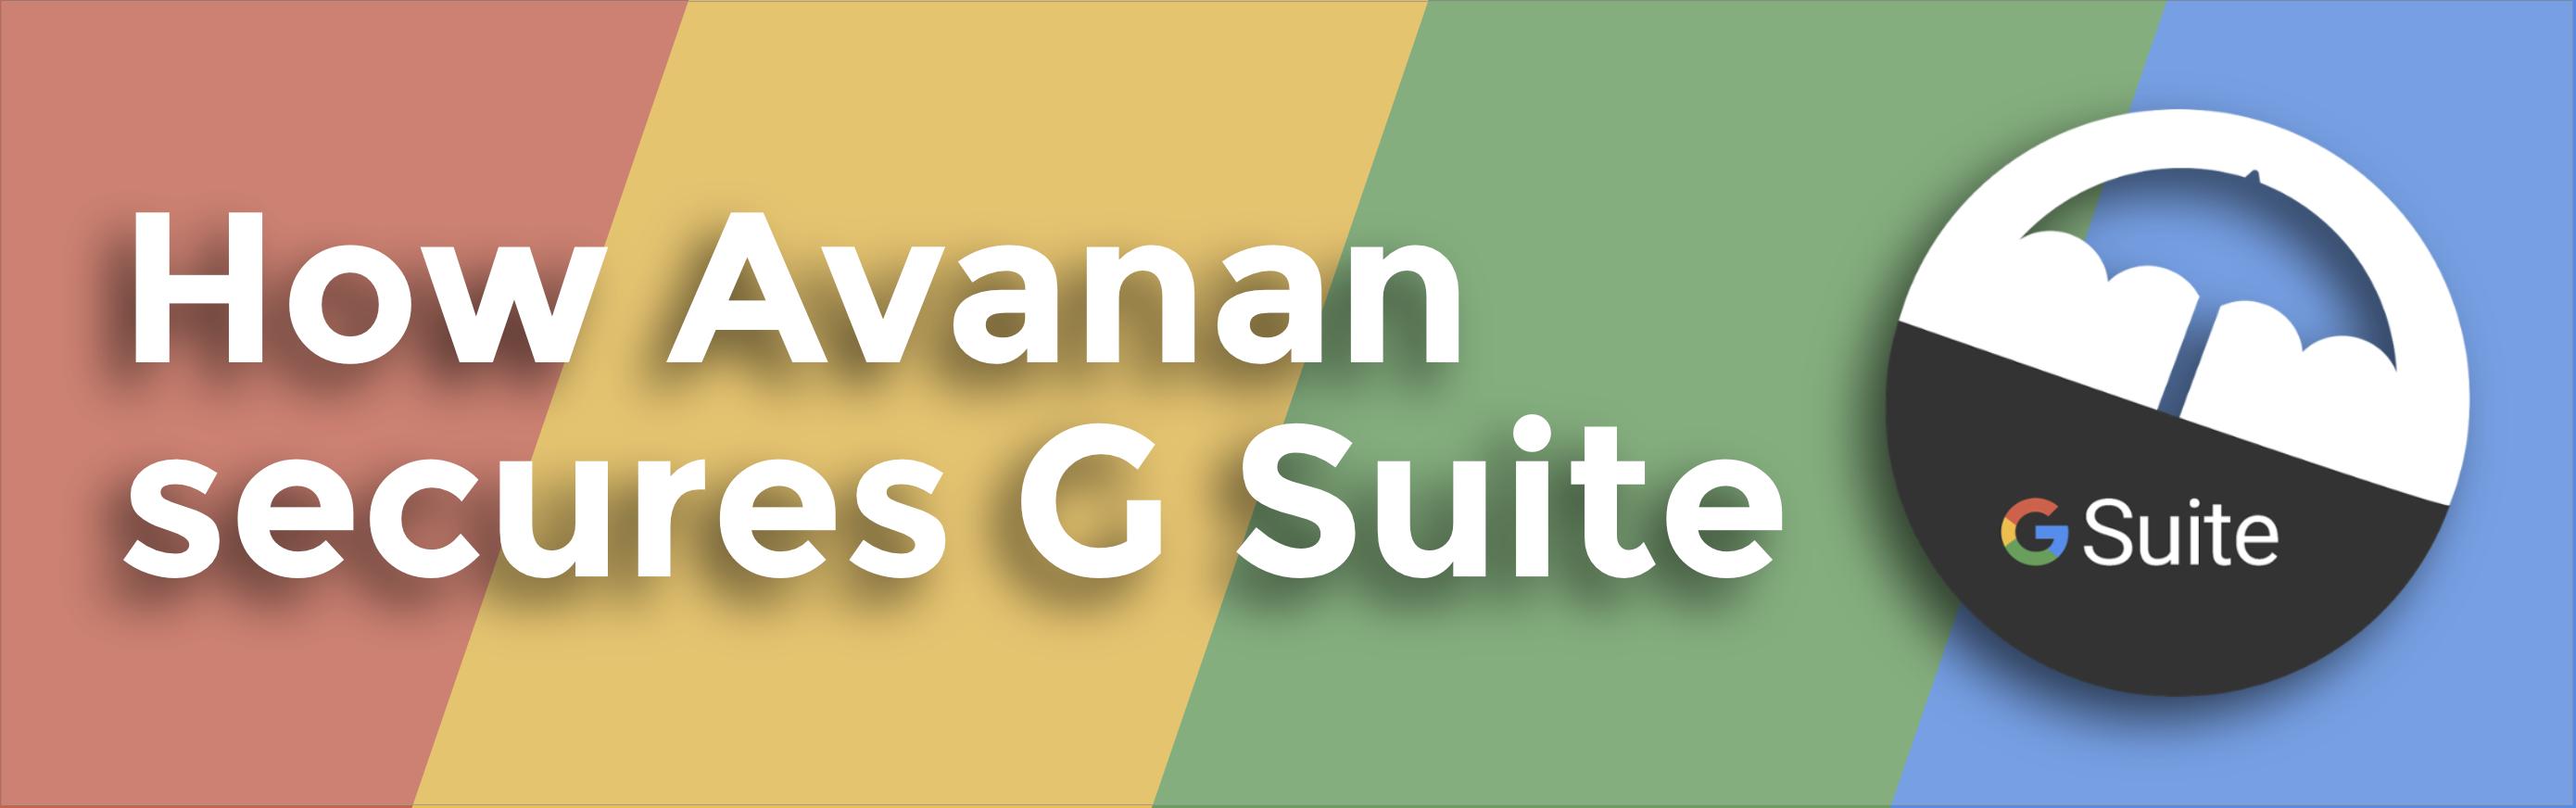 How Avanan Secures G Suite